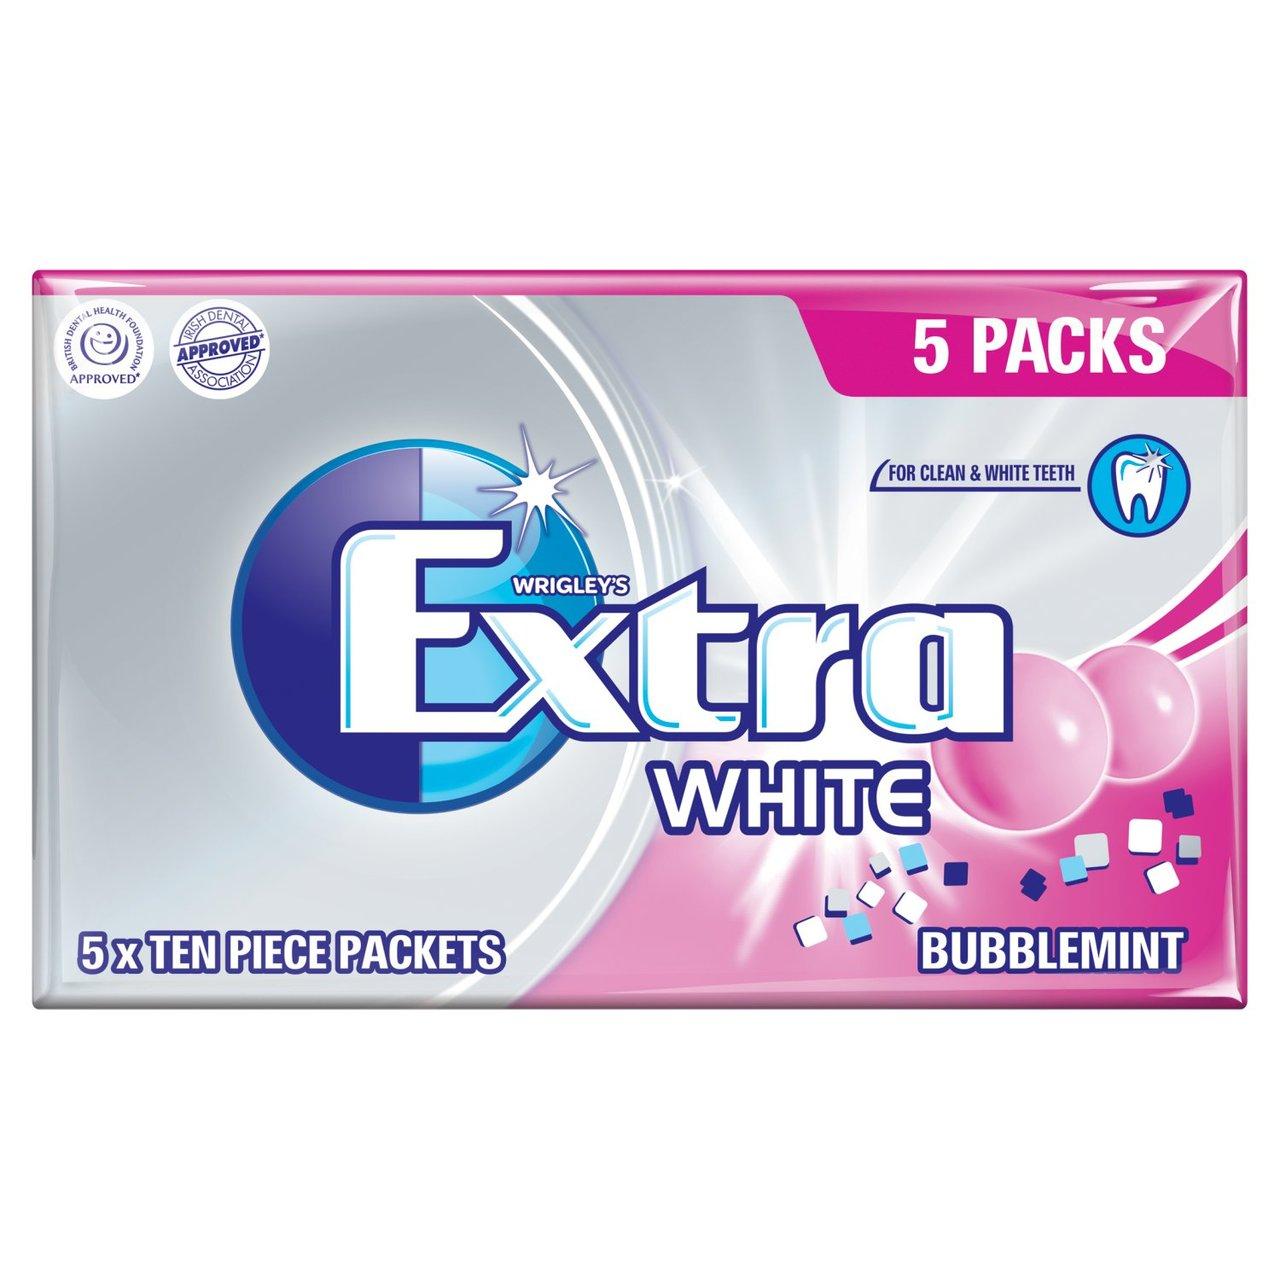 Wrigley's Extra White Bubblemint Bubblegum 5 packs 99p @ Home bargains